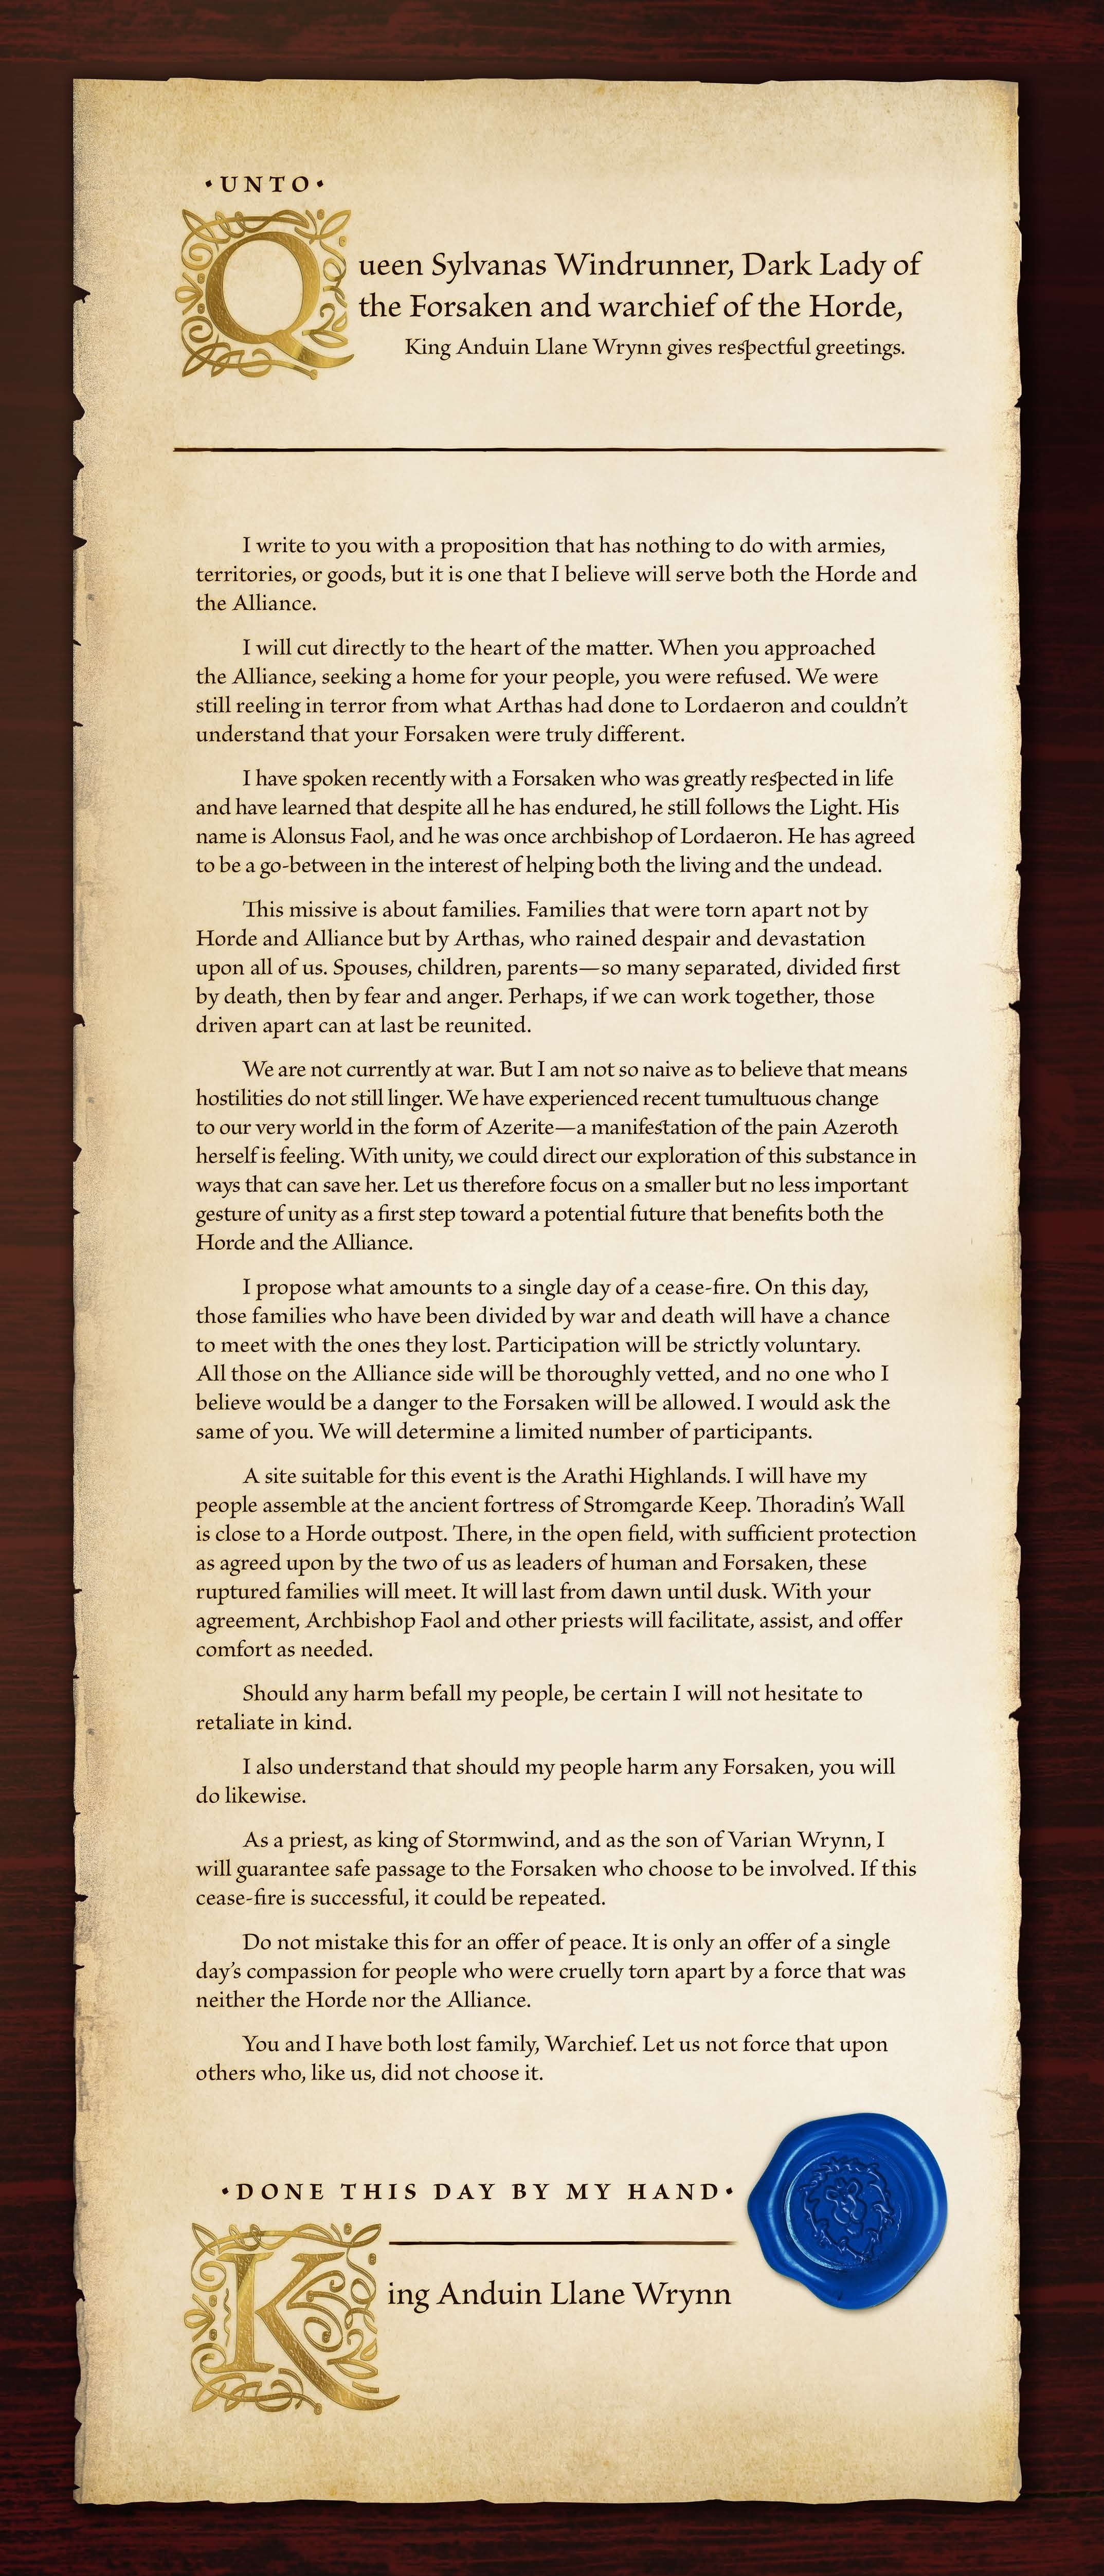 Vulpera guide galeria world of warcraft de perculia em 30052018 reportar fandeluxe Image collections